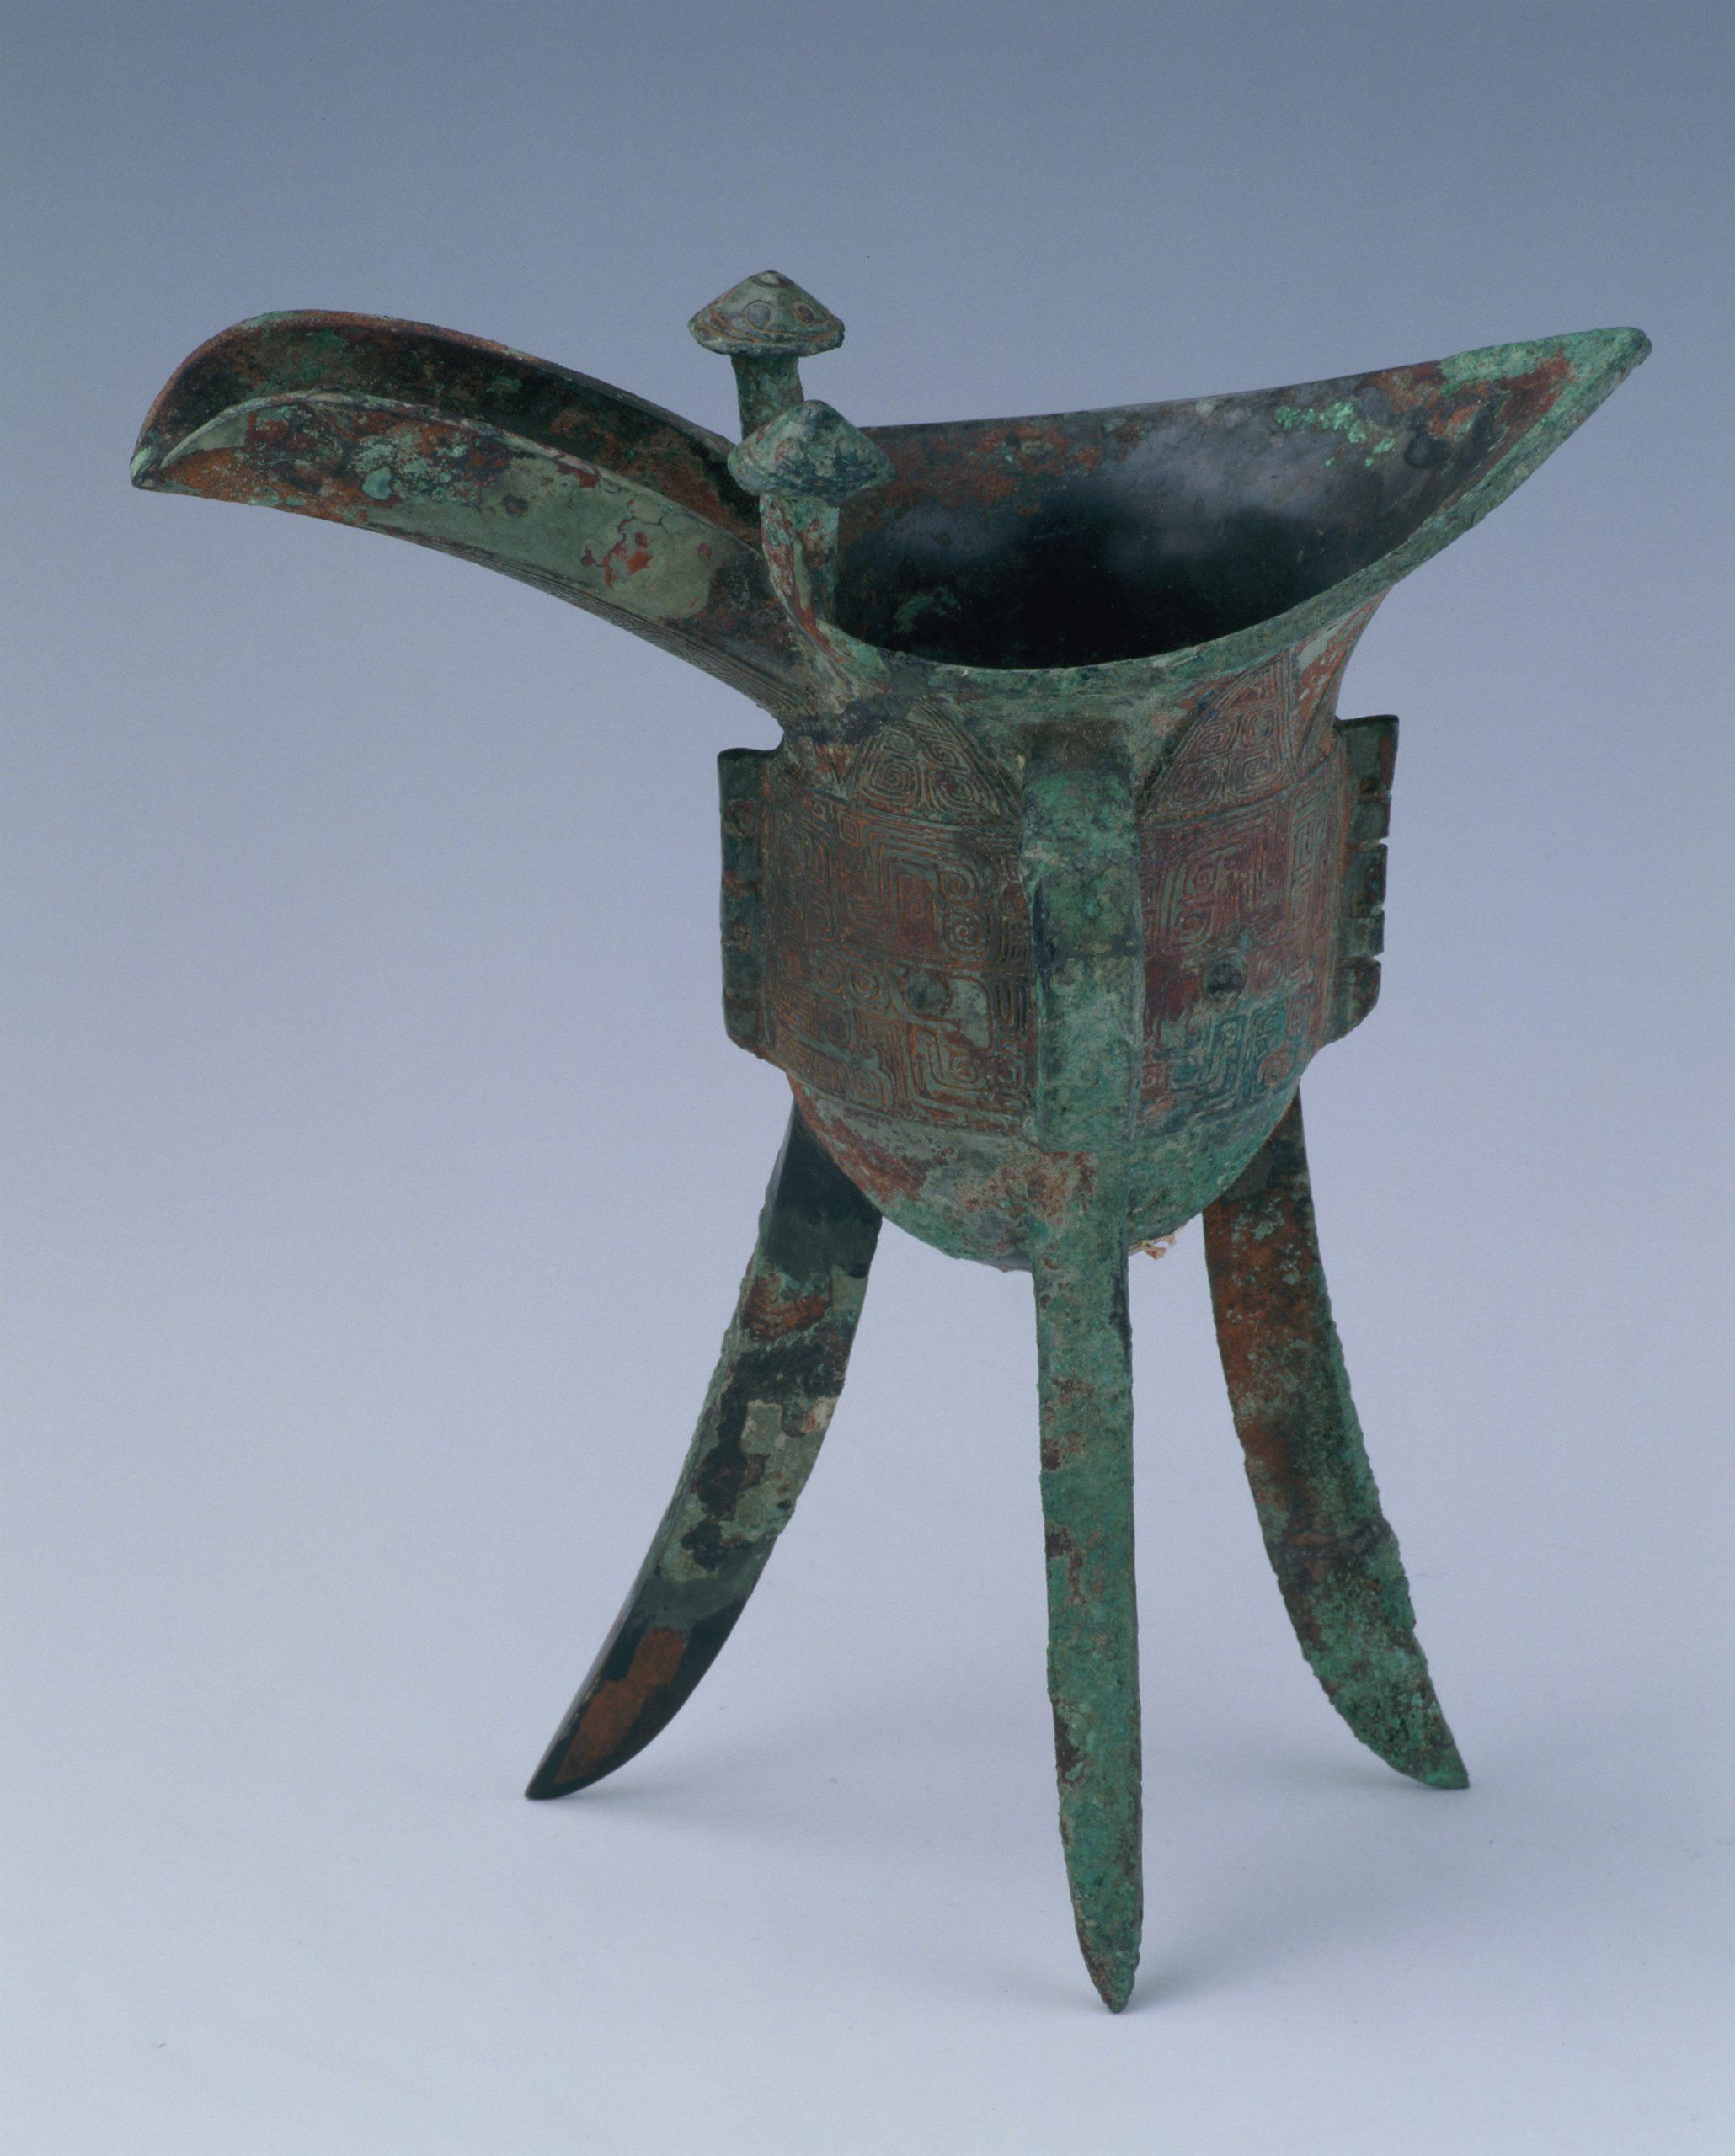 10.铜爵 Tripode jue 爵 en bronze